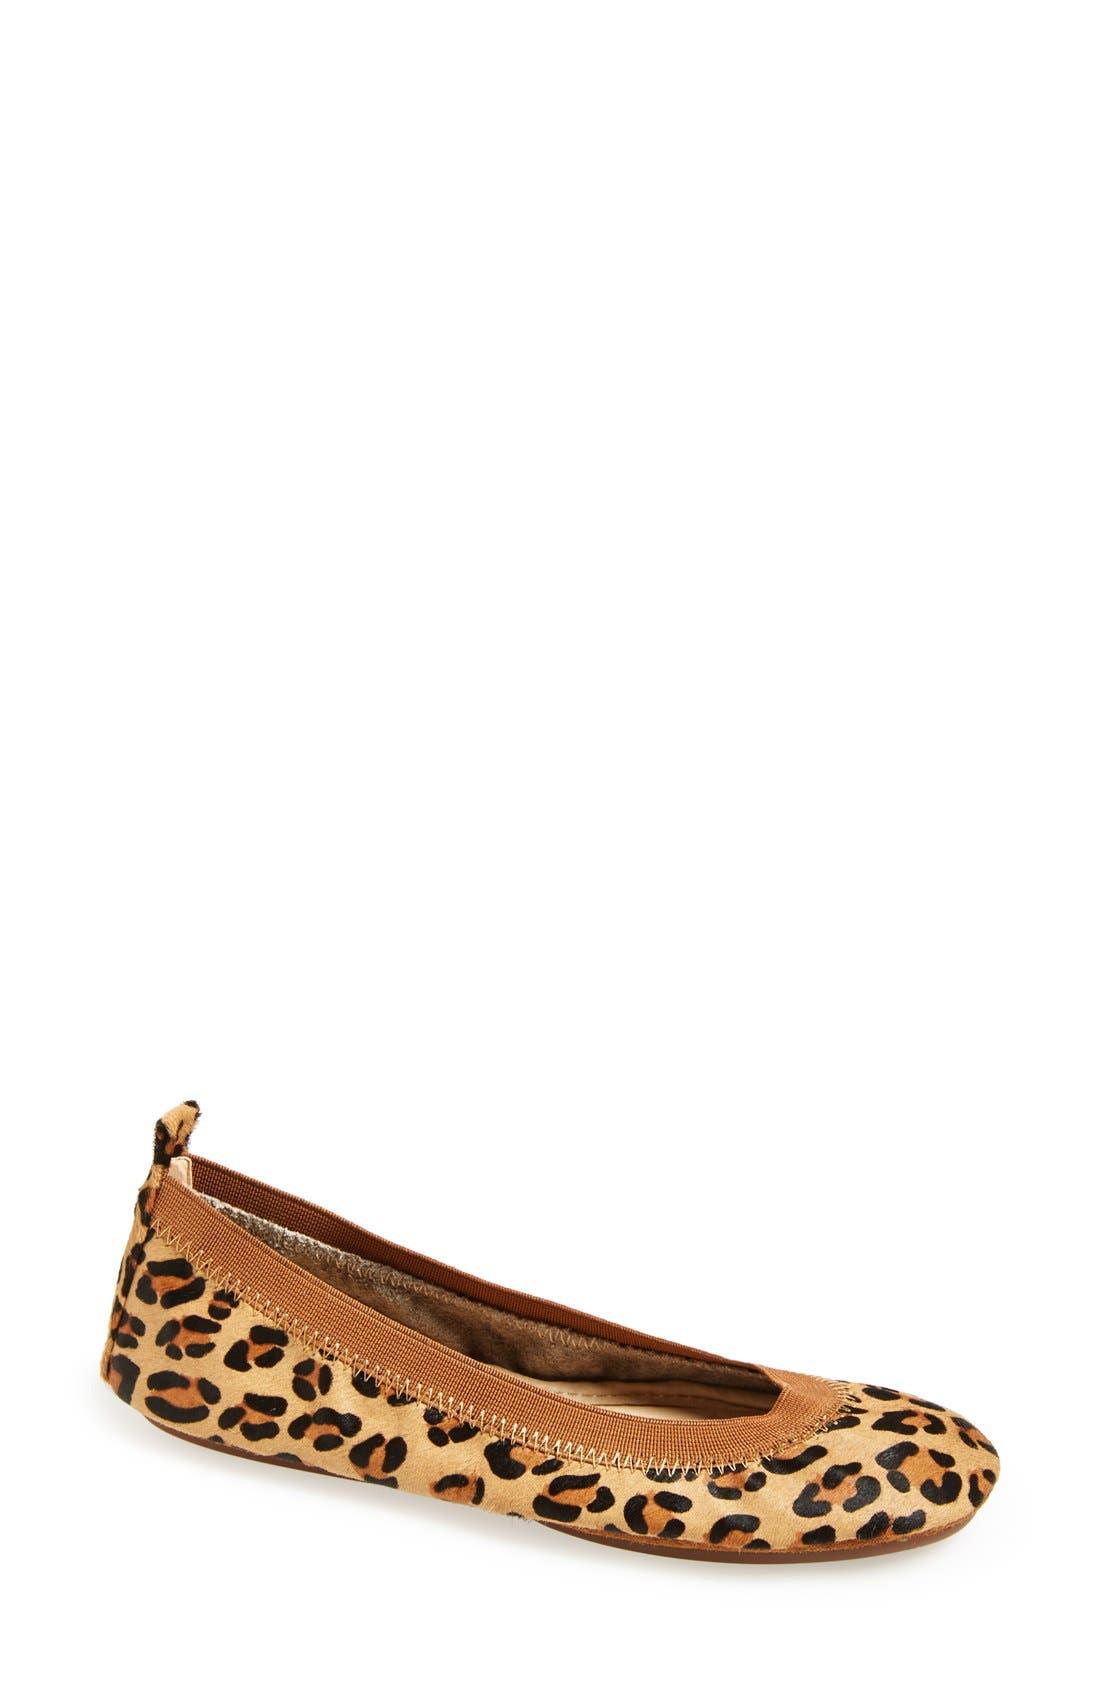 'Samara' Genuine Calf Hair Foldable Ballet Flat,                             Main thumbnail 1, color,                             201